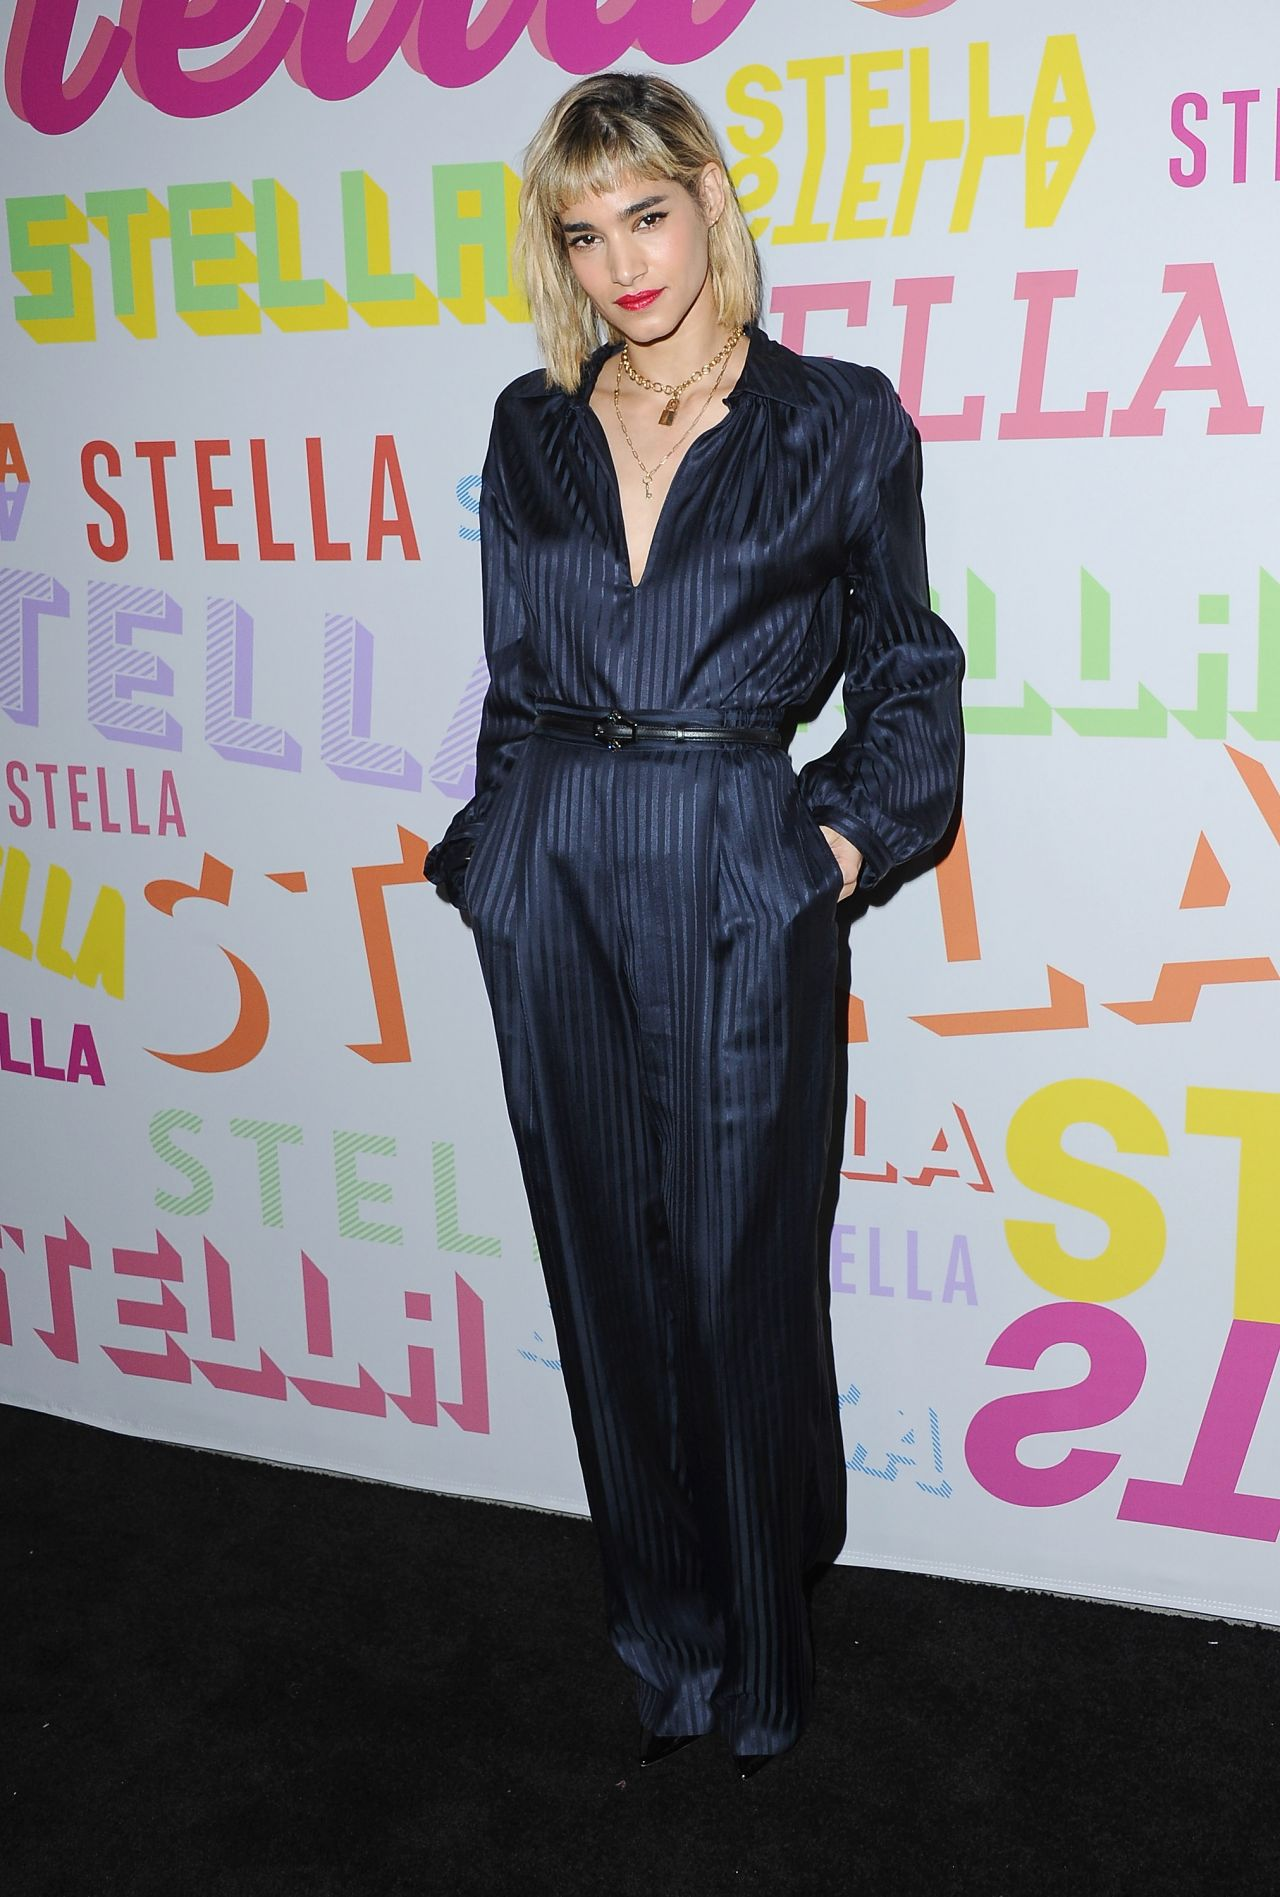 http://celebmafia.com/wp-content/uploads/2018/01/sofia-boutella-stella-mccartney-show-in-hollywood-2.jpg